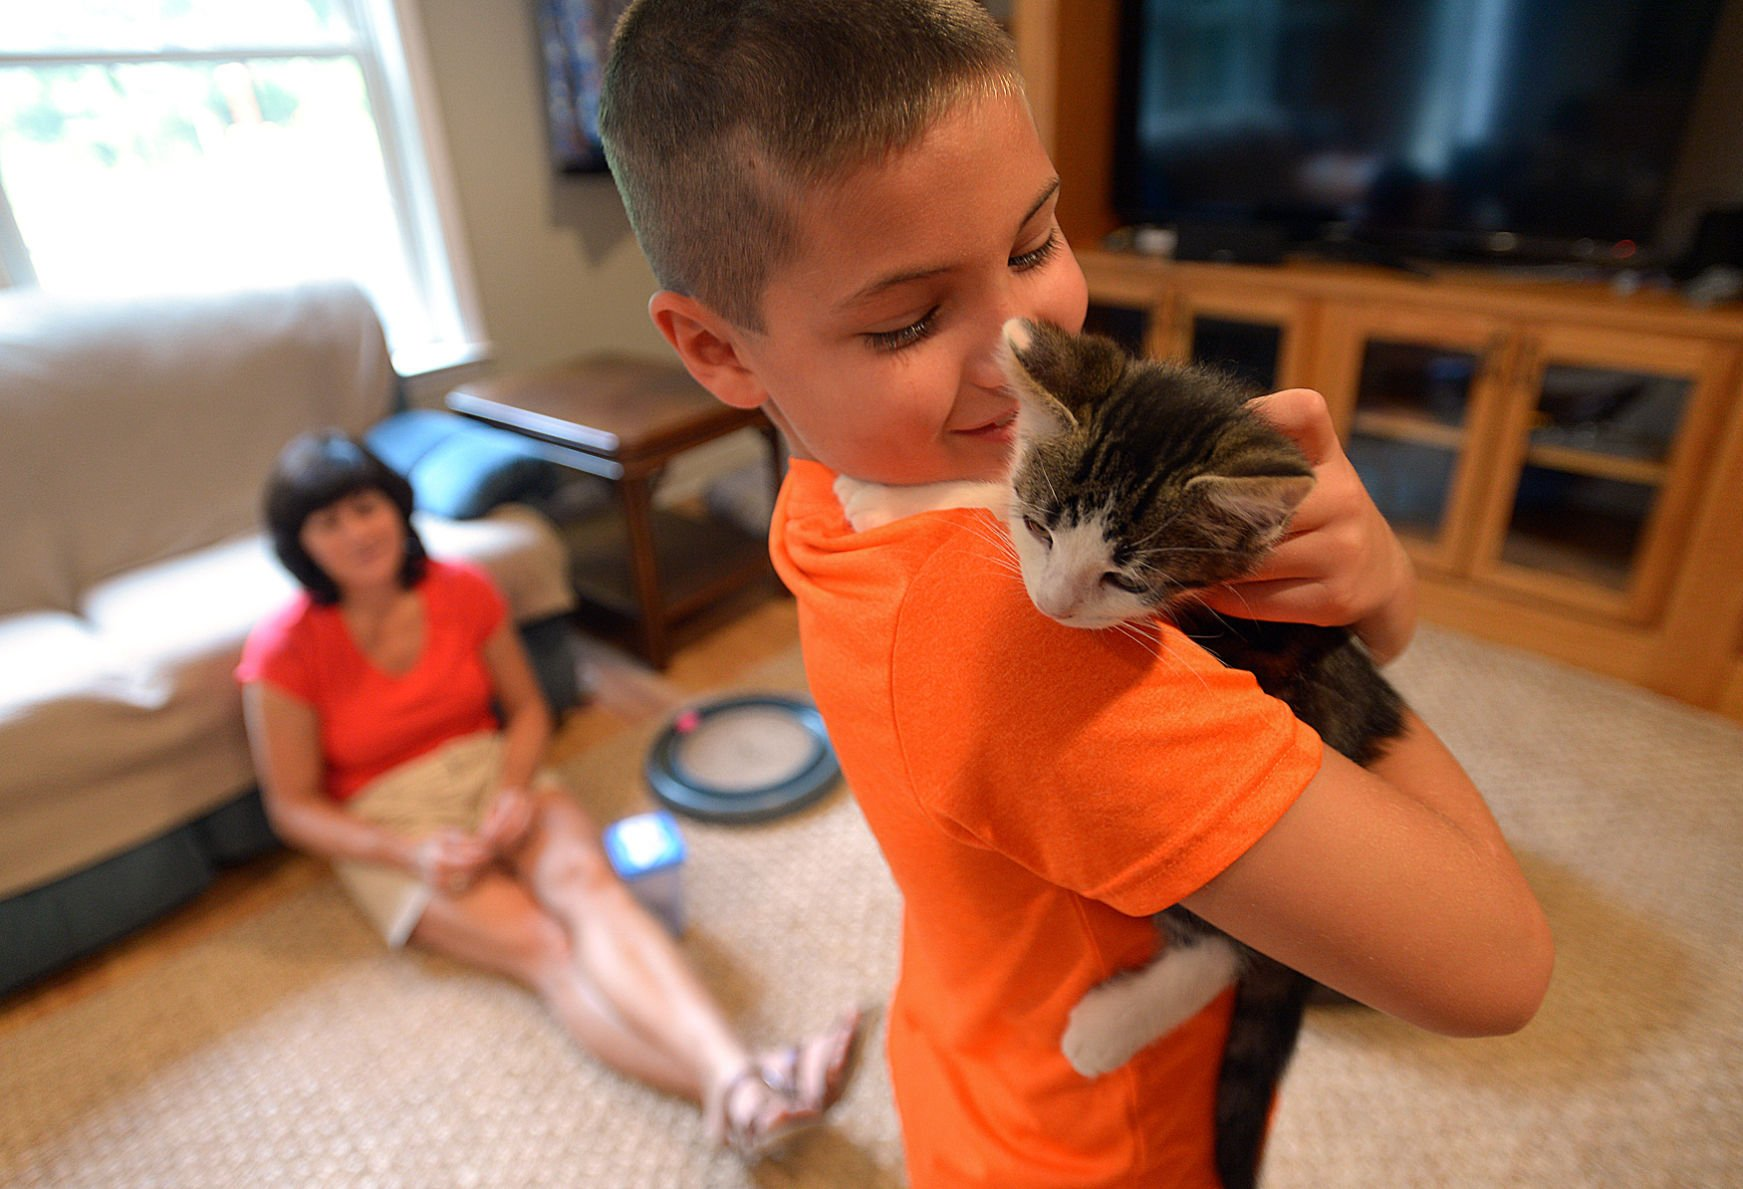 Closer Look Volunteers describe life as foster